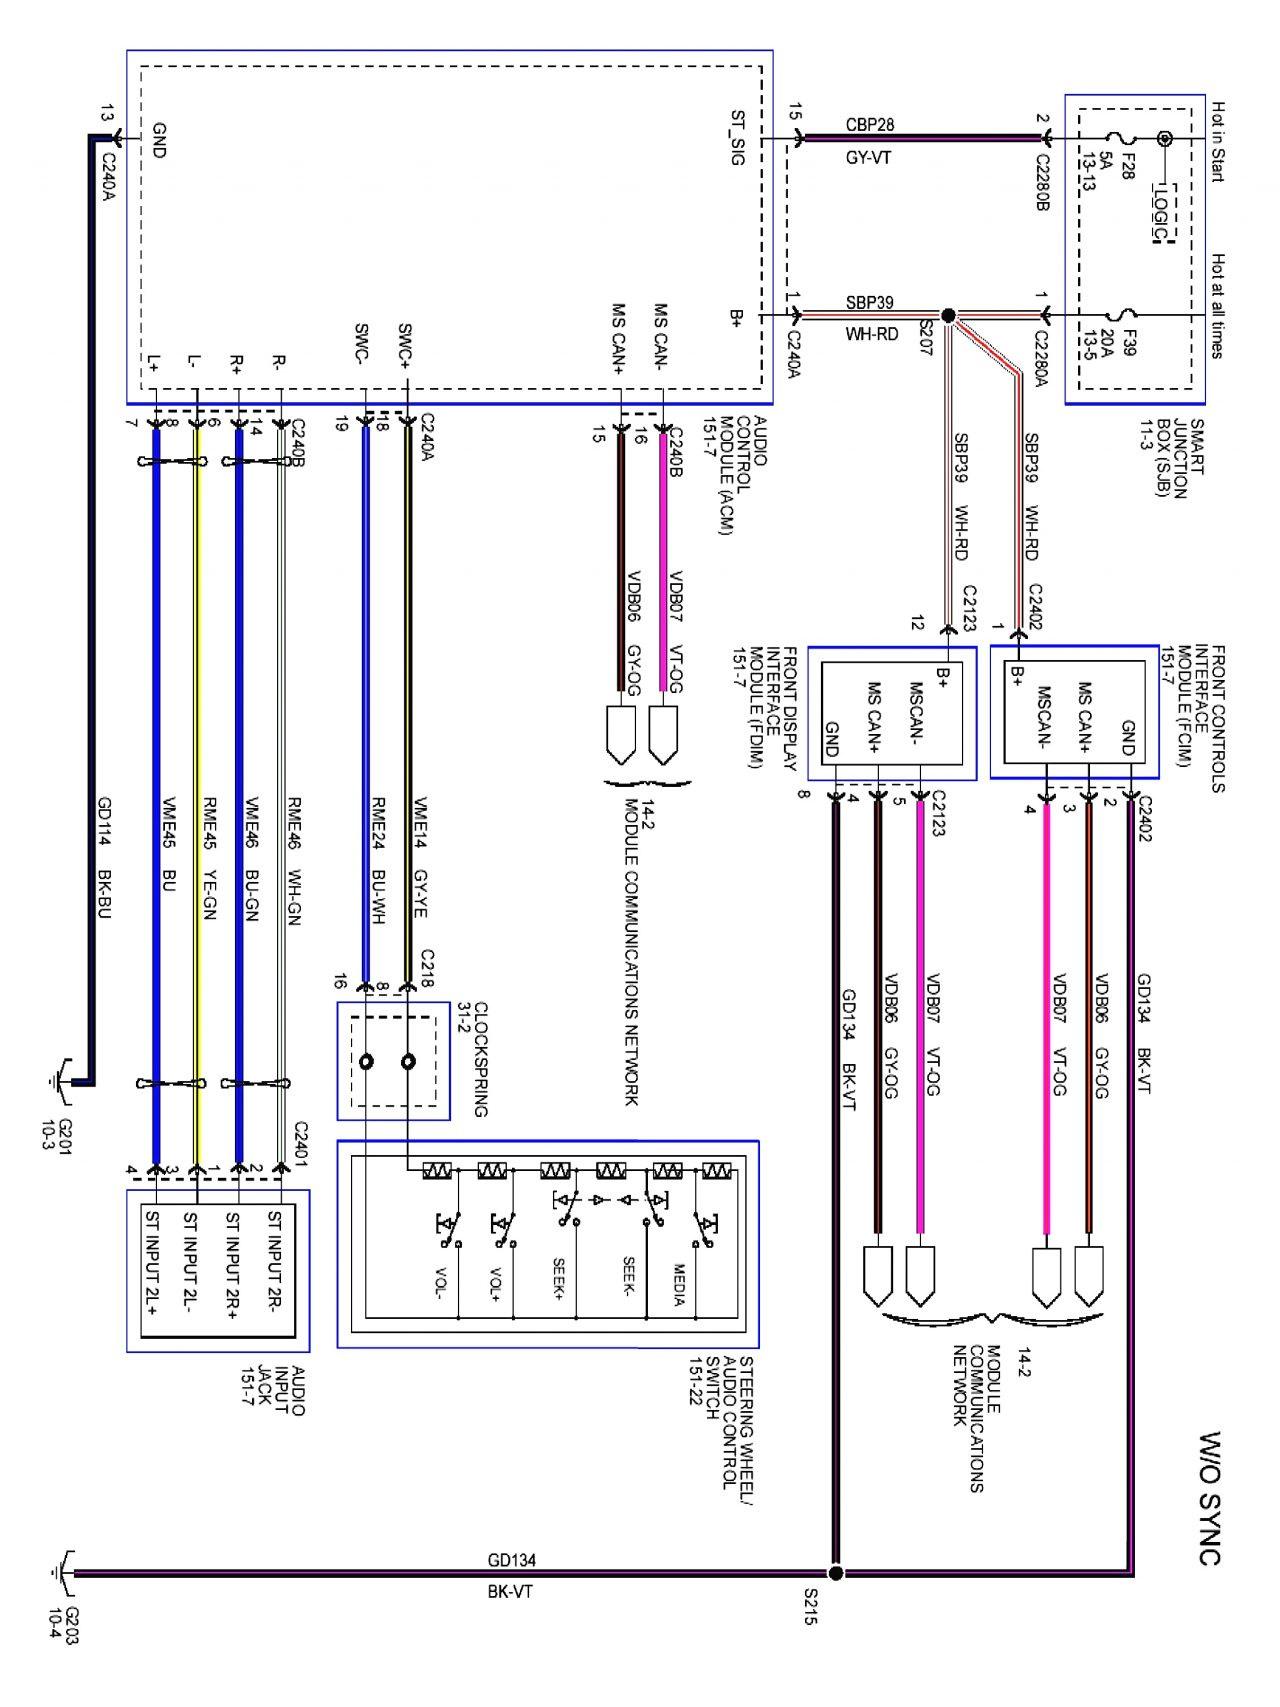 TN_1664] 2011 Ford Taurus Radio Wiring Diagram Schematic WiringAesth Skat Eatte Egre Wigeg Teria Xaem Ical Licuk Carn Rious Sand Lukep  Oxyt Rmine Shopa Mohammedshrine Librar Wiring 101